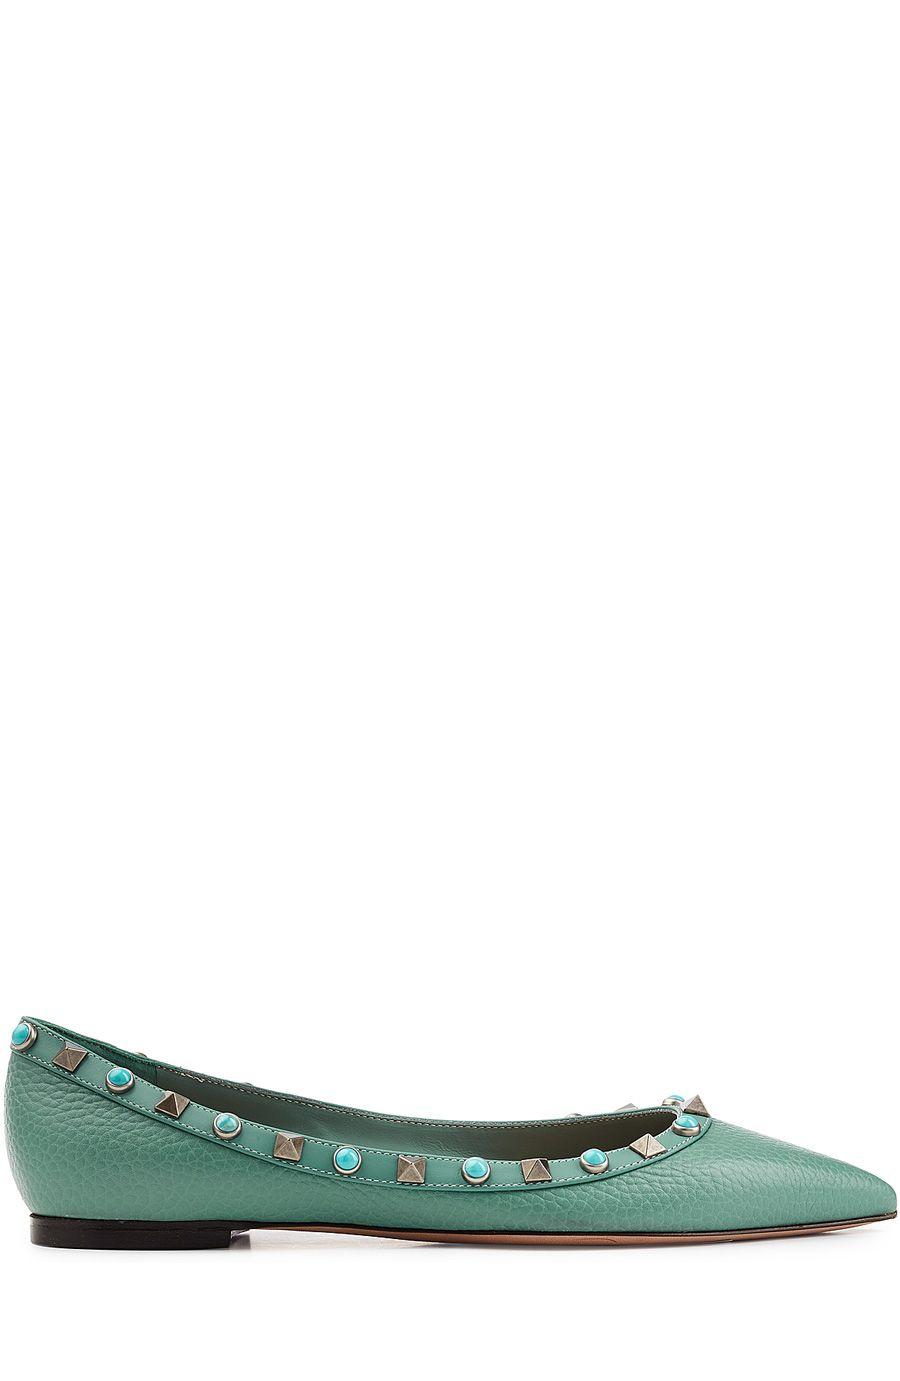 Heels for dark green dress  Rockstud Rolling Leather Ballerinas Dark Greee  Pinterest